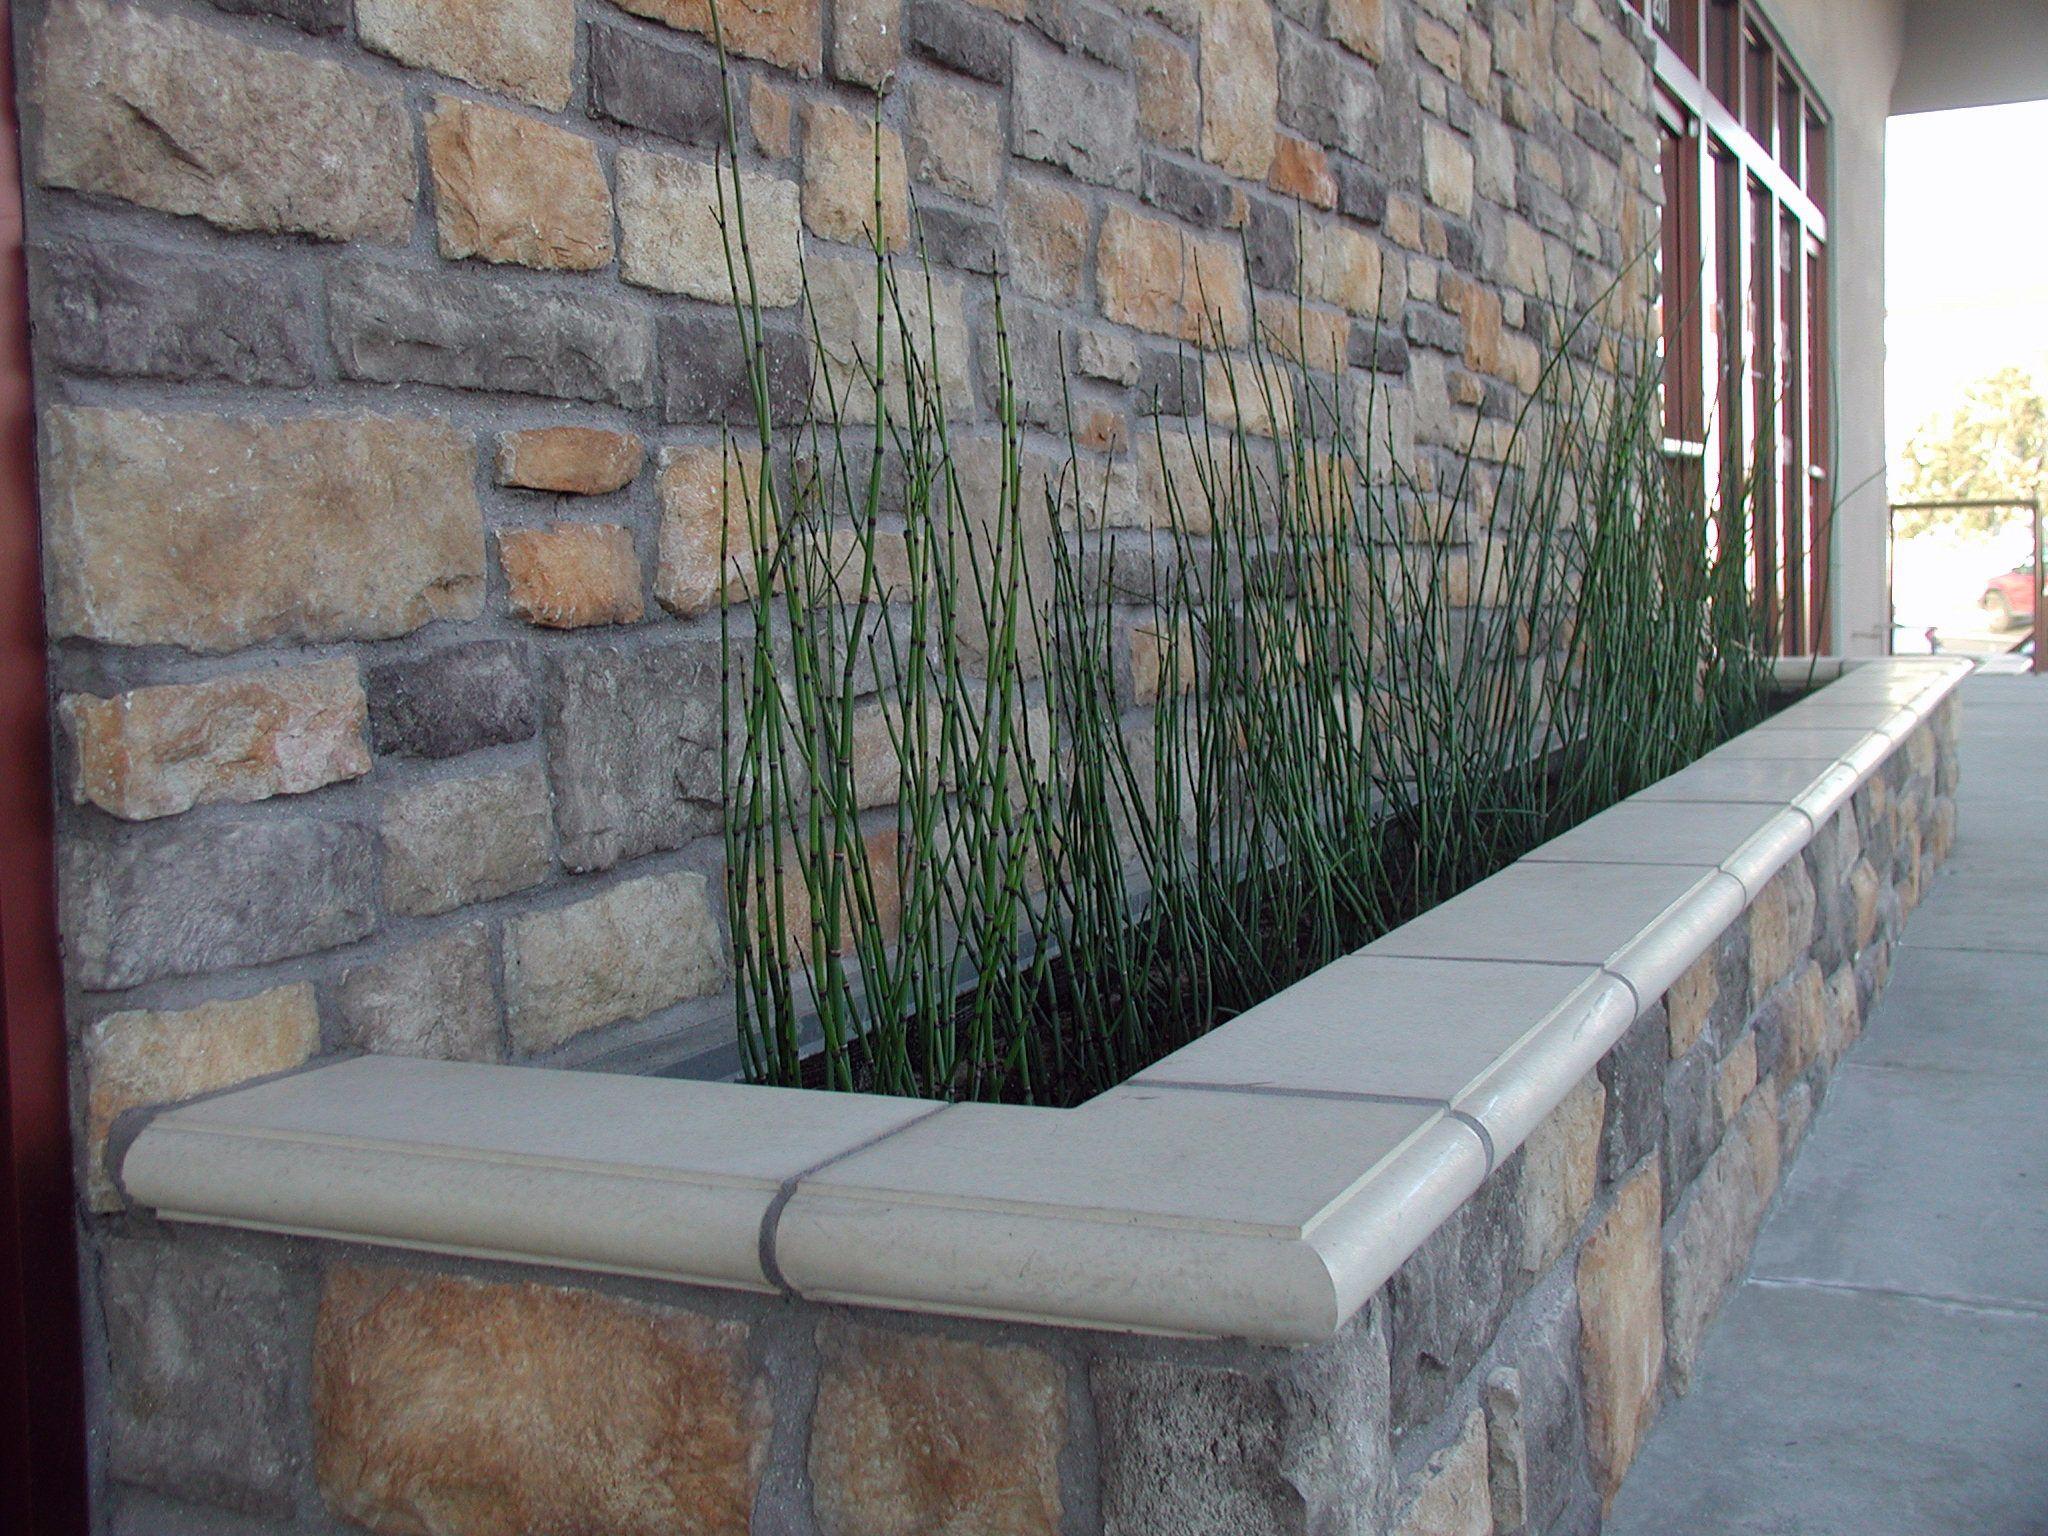 Stone Wall Planter Concrete Wall Outside Flooring Garden Bench Seating